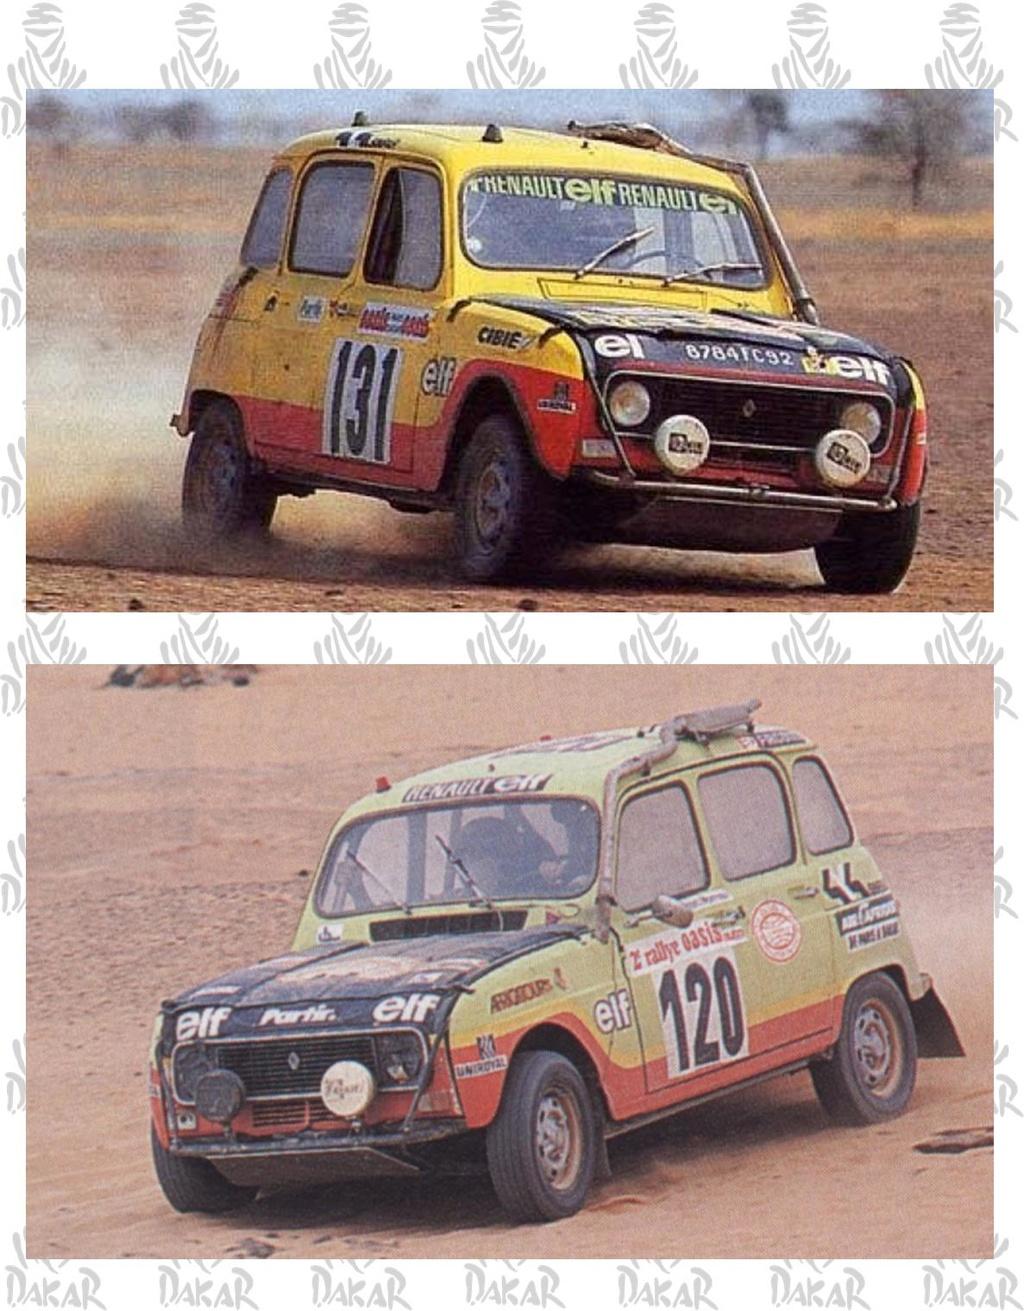 [1/24]Renault 4 l dakar 1980 Ref 80759 Image225